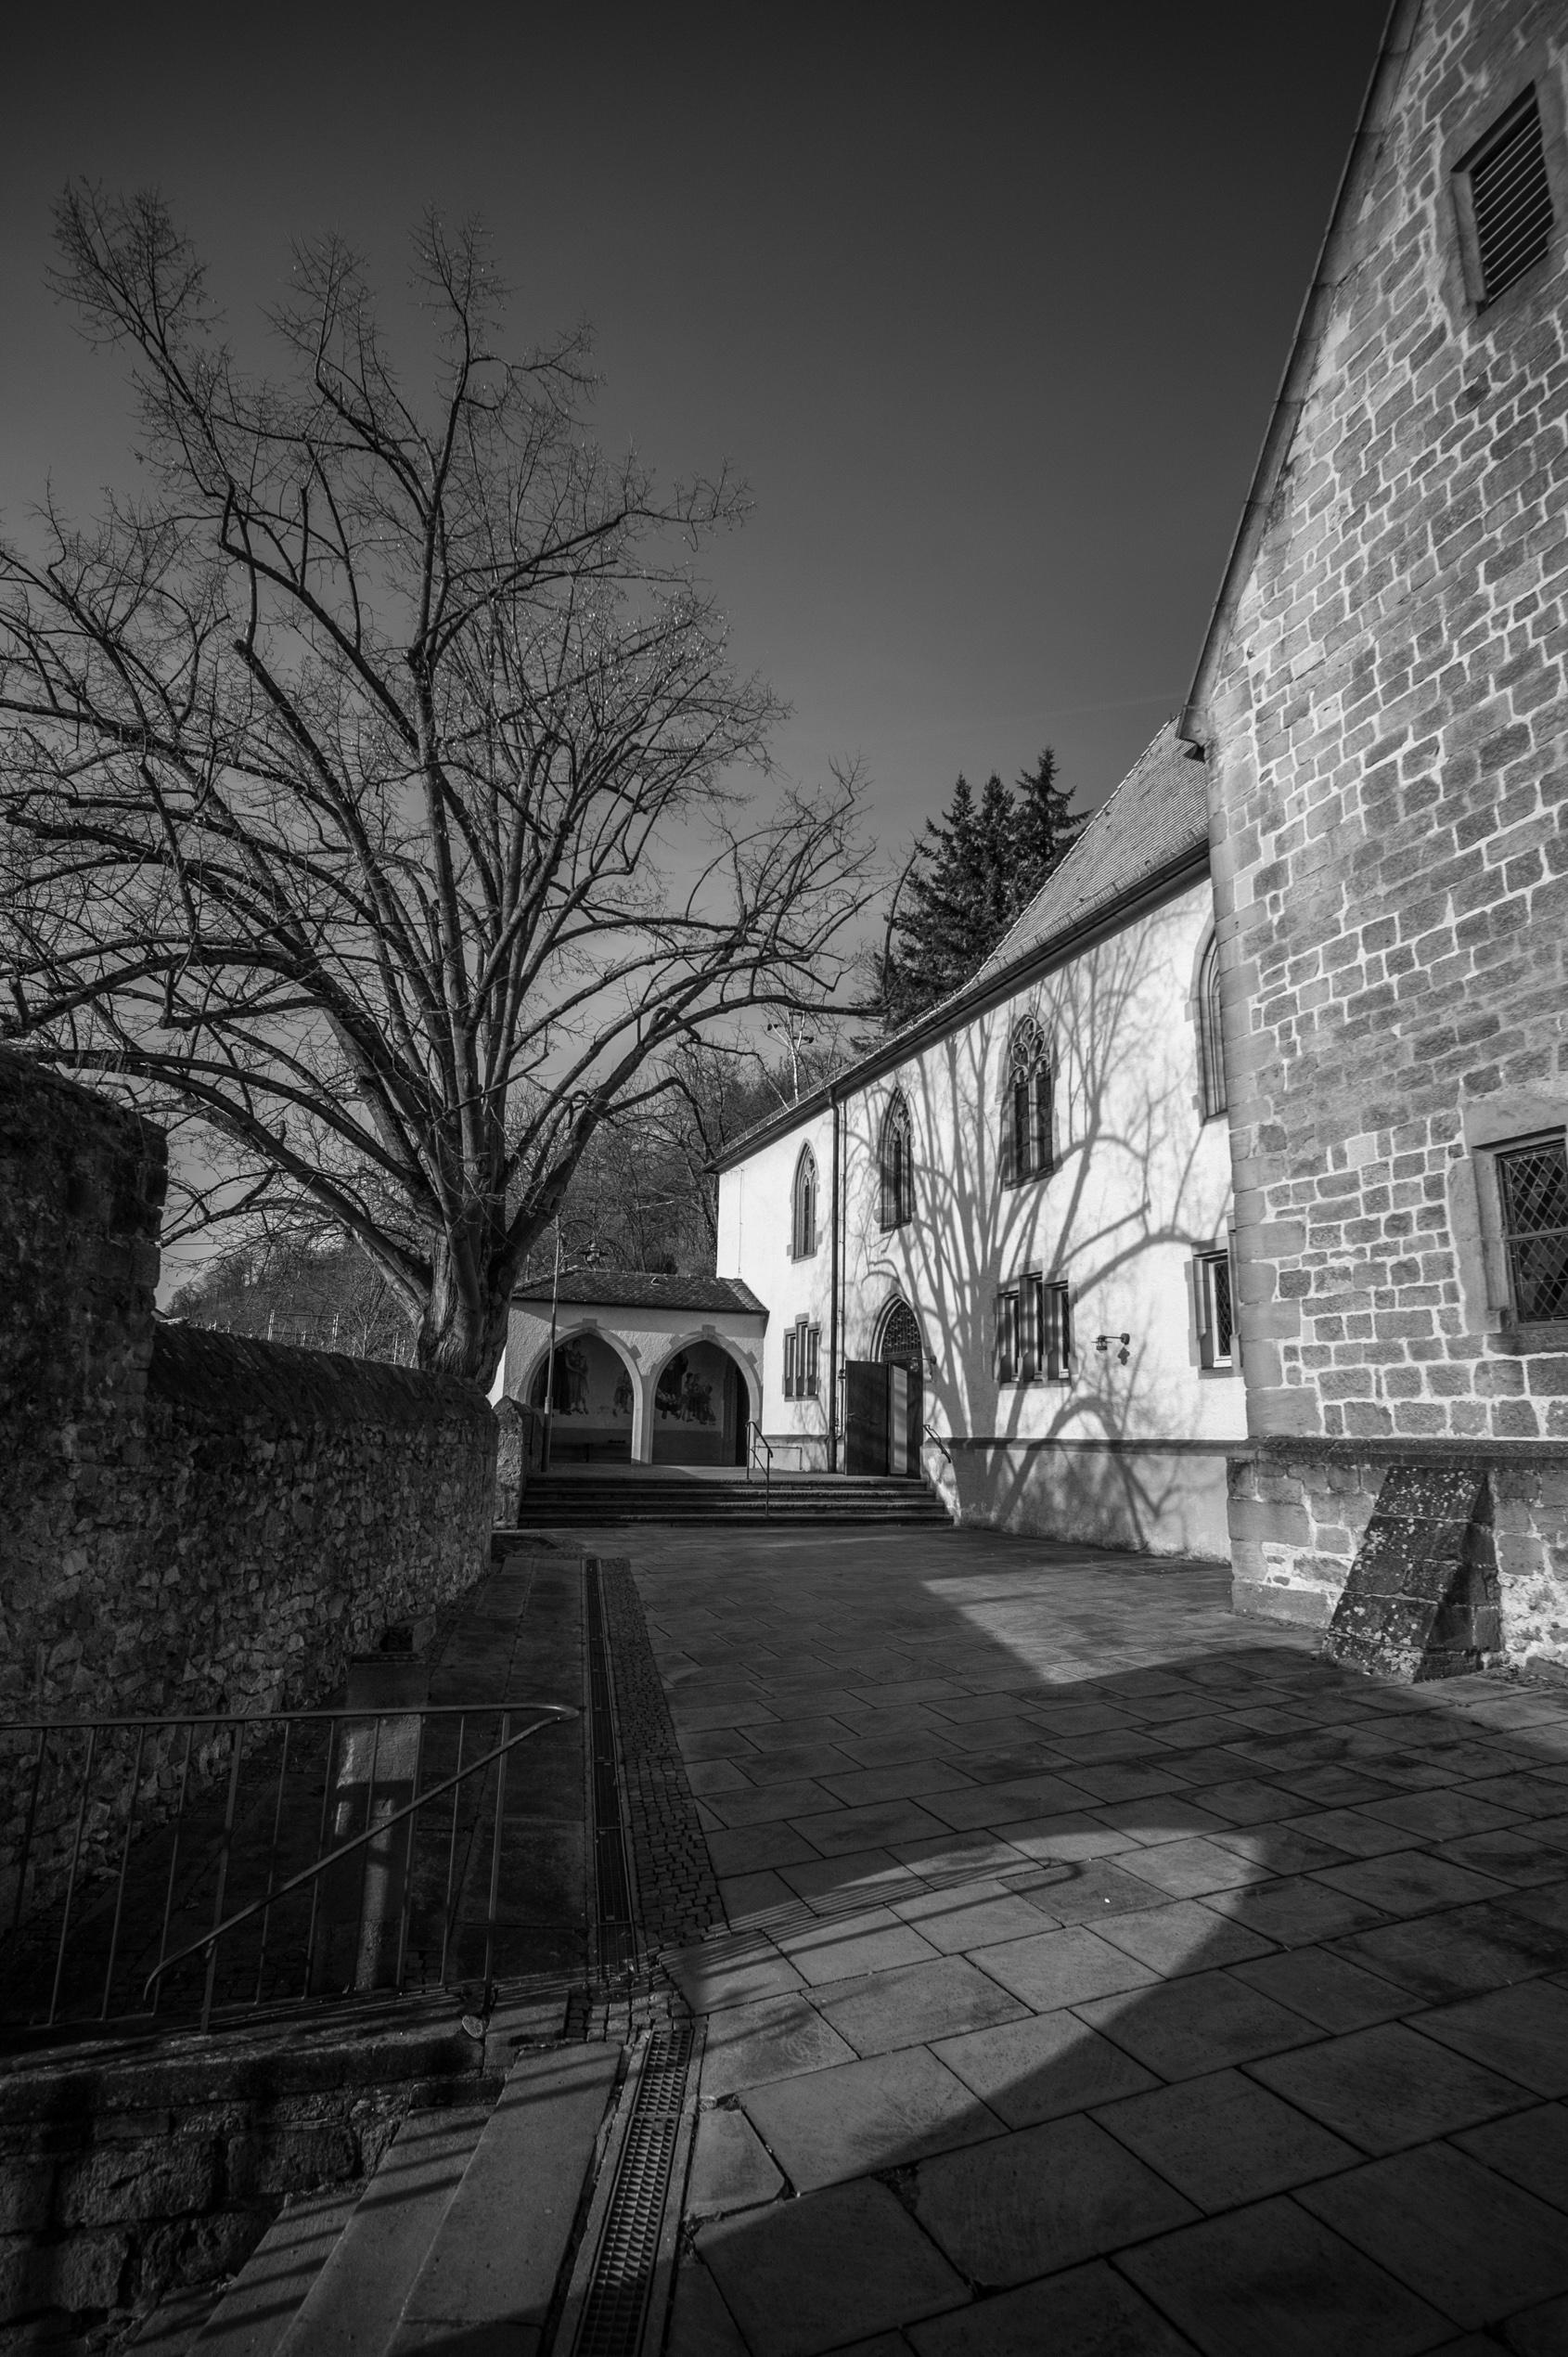 KirchenImDekanat-1000961 by .